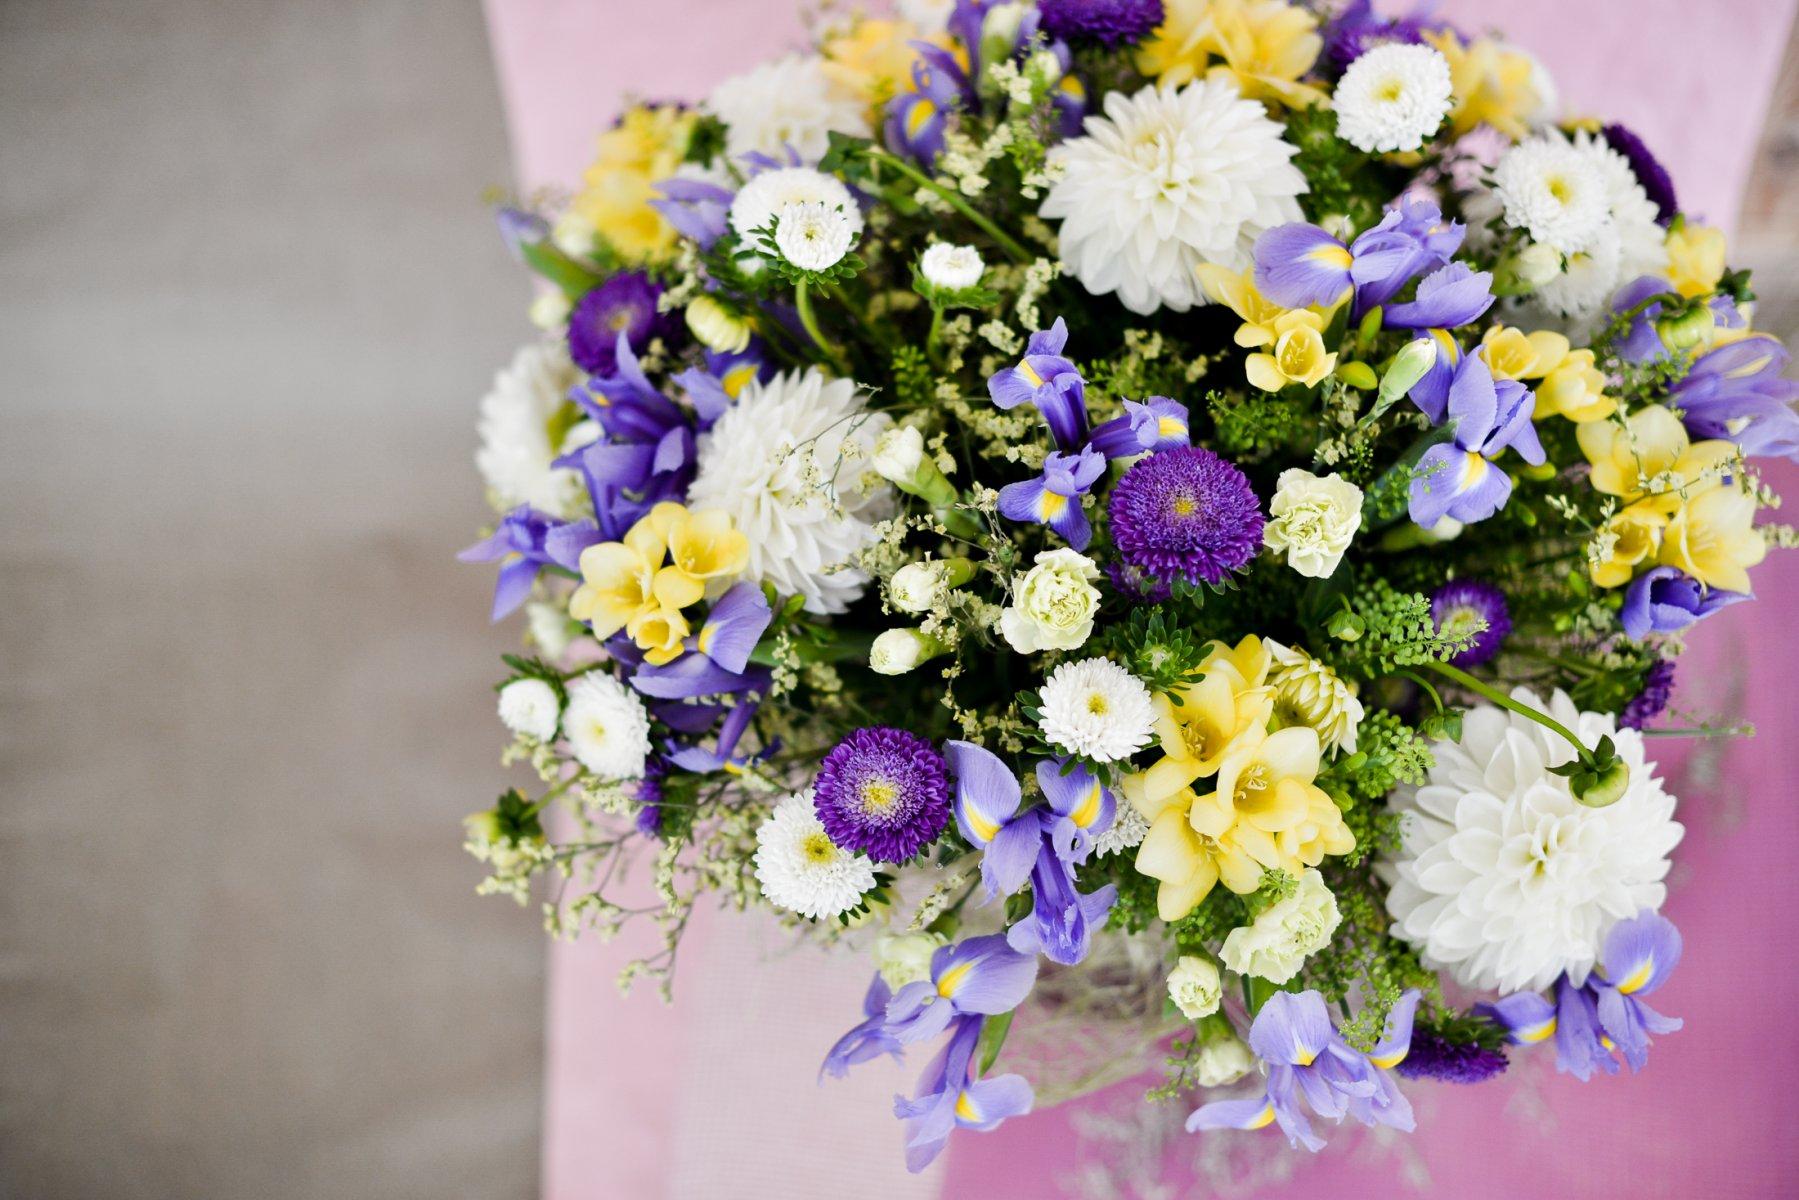 Казани бутик букет магазин цветов на тверской сильвия доставка цветов